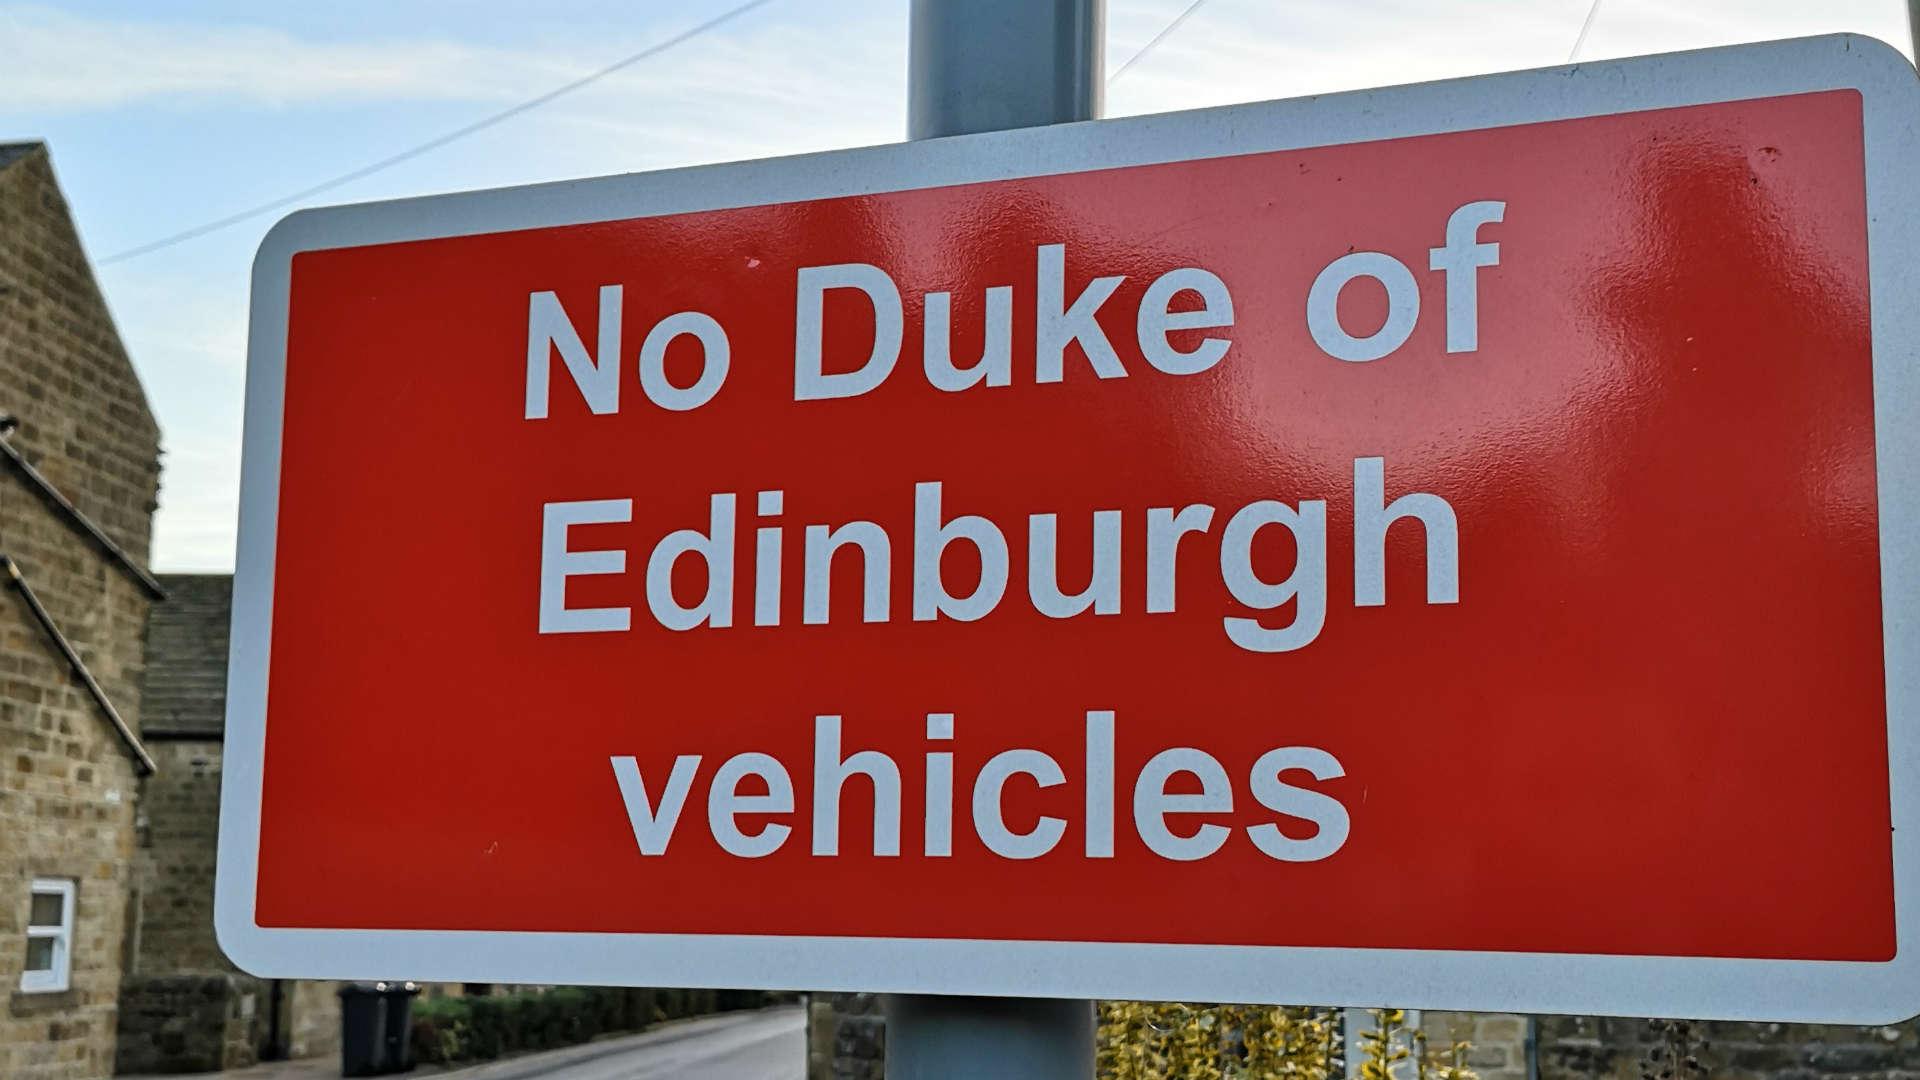 No Duke of Edinburgh vehicles